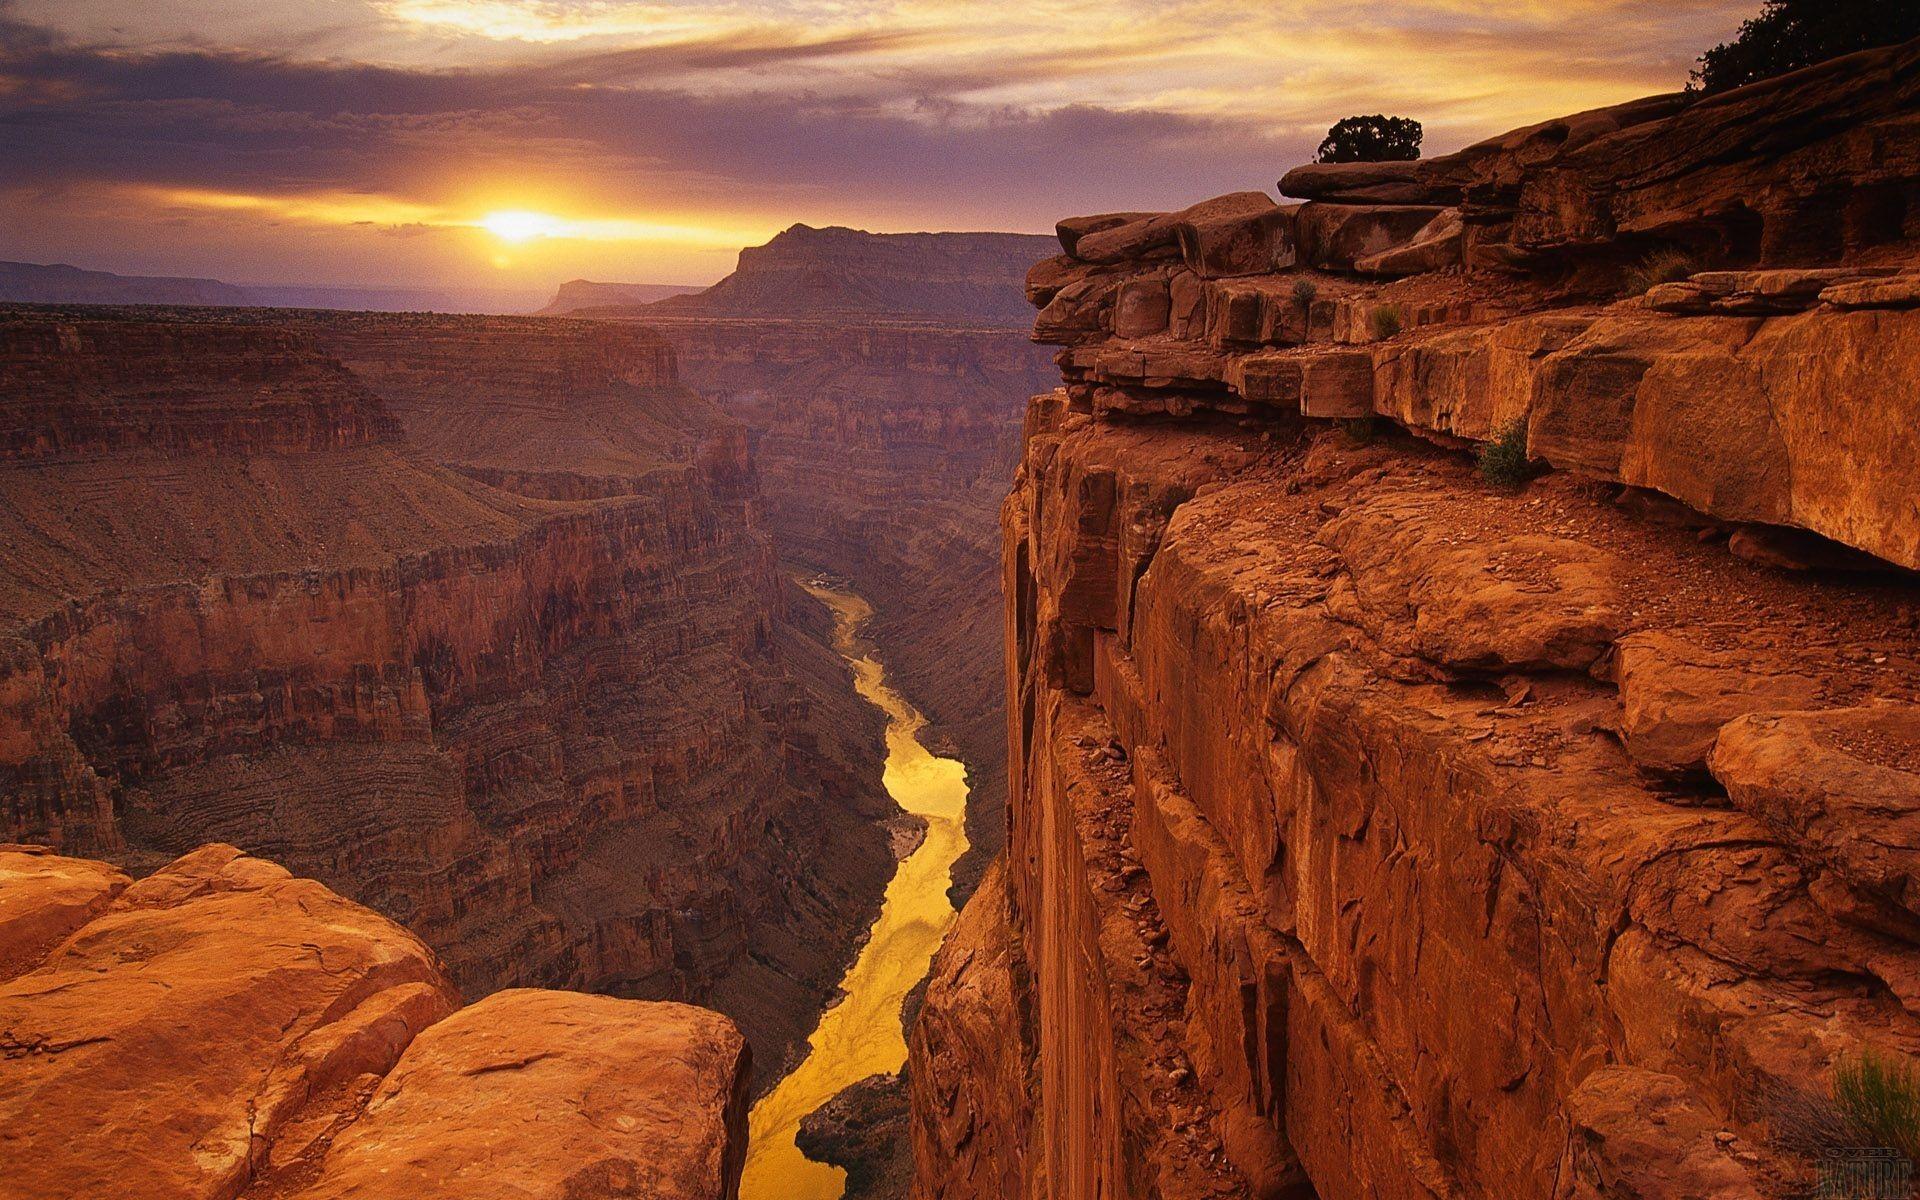 … grand canyon mountain in arinzona free hd wallpapers …